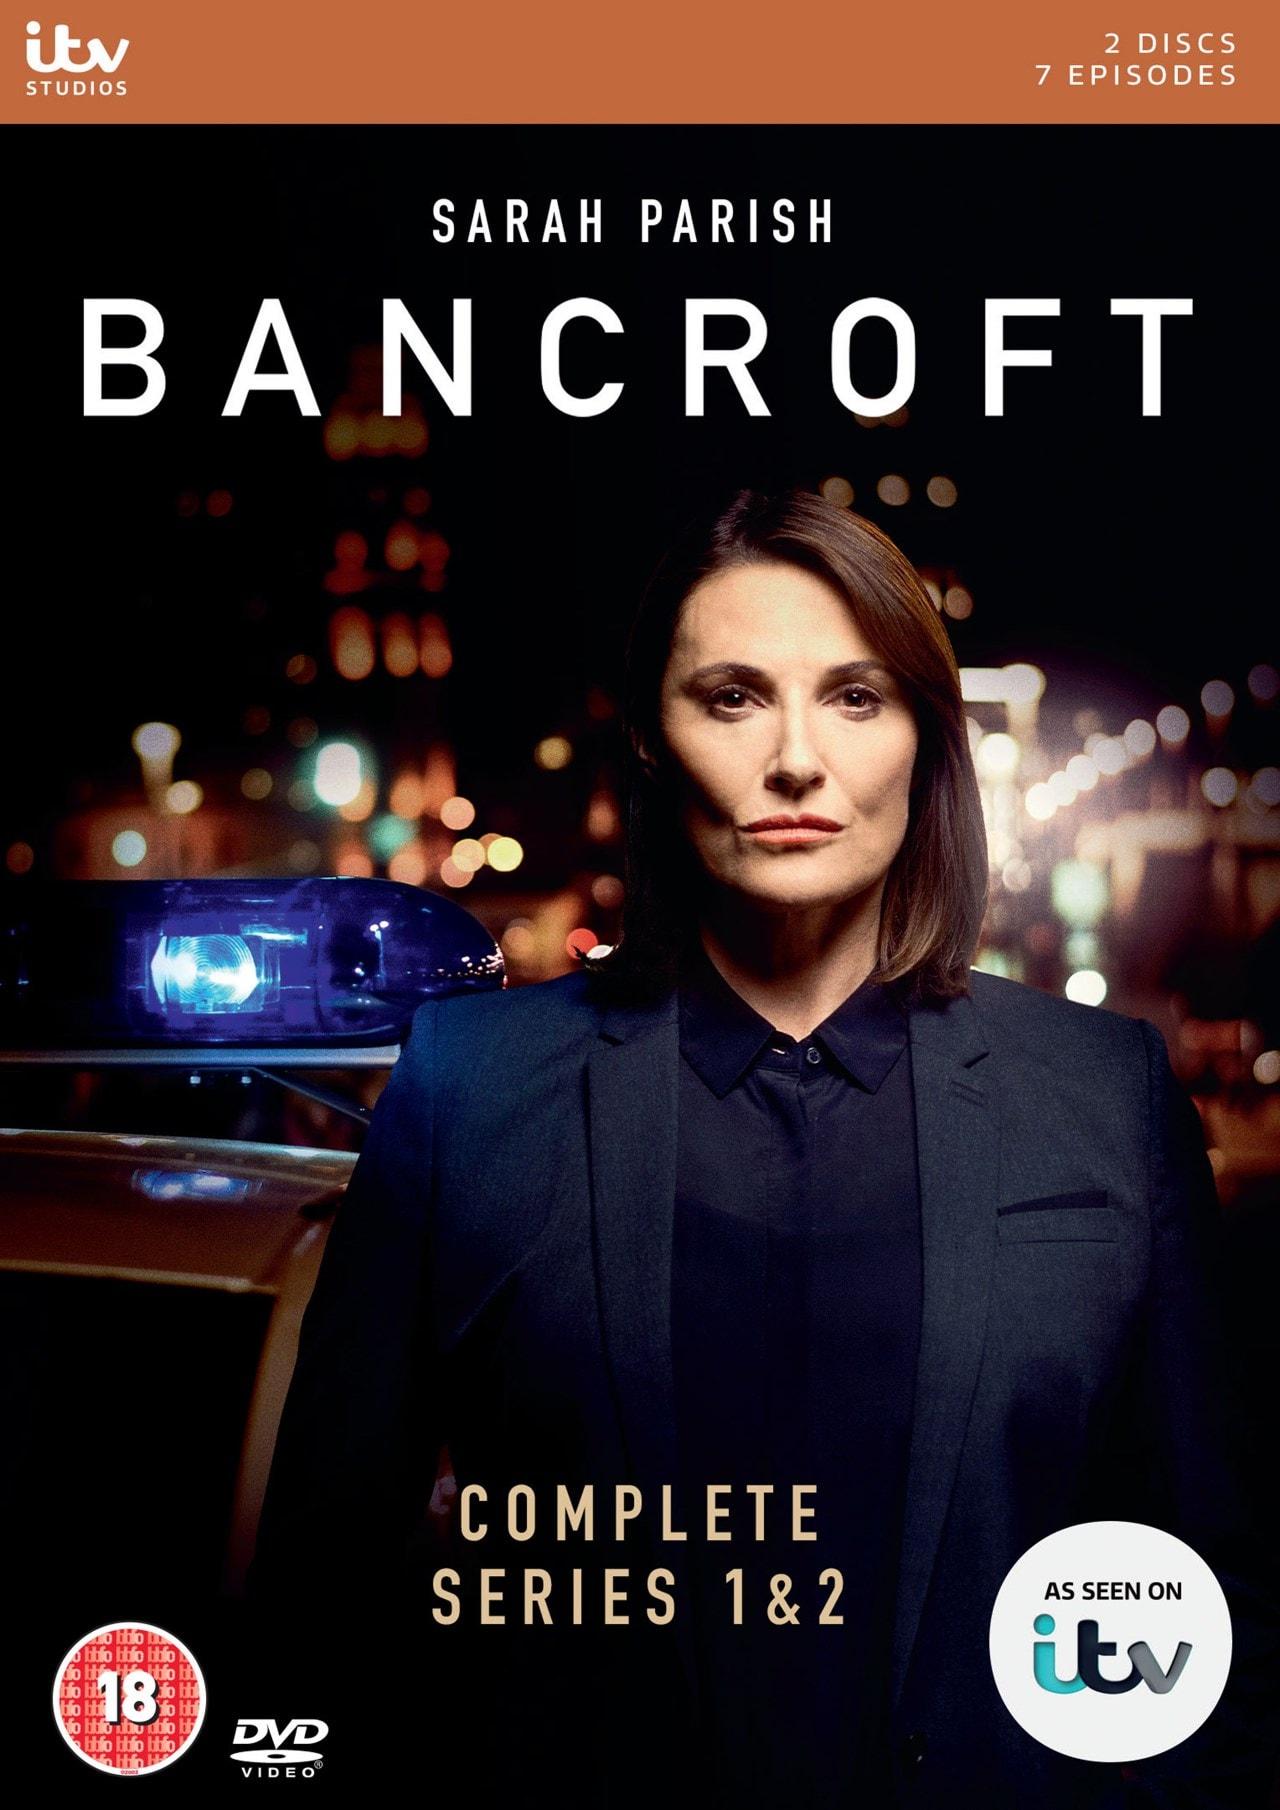 Bancroft: Complete Series 1 & 2 - 1